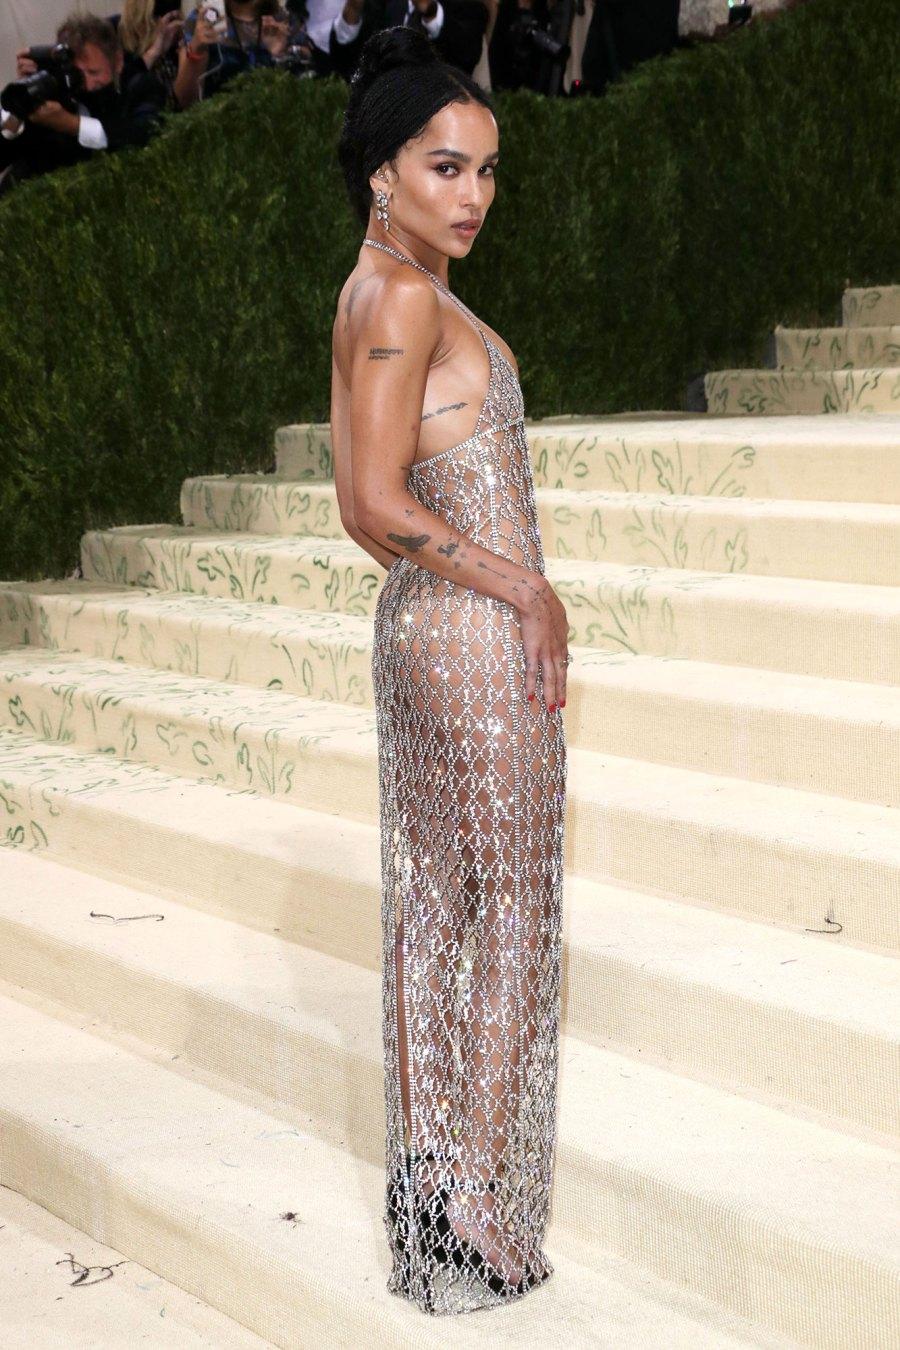 Channing Tatum and Zoe Kravitz Leave Met Gala Together After Walking Red Carpet Separately 2021 Met Gala 04